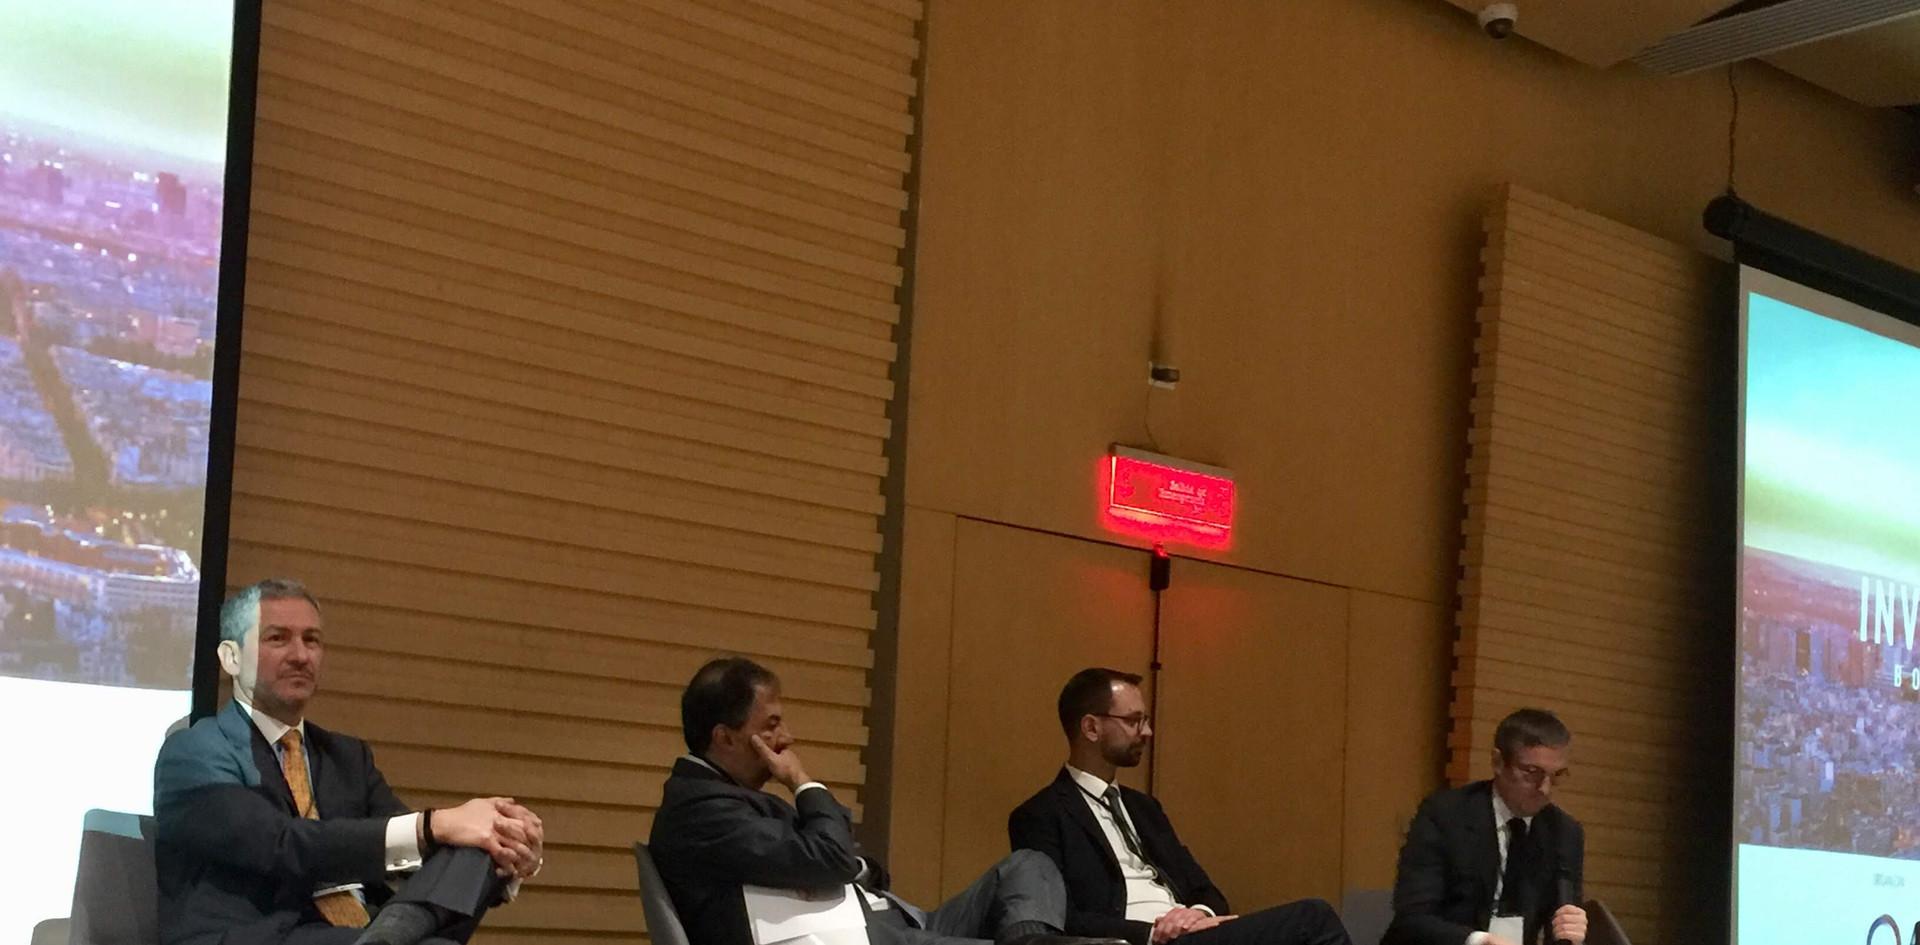 Fernando Mantilla, Antonio Aljure, Florian Brenchon, Mathias Audit